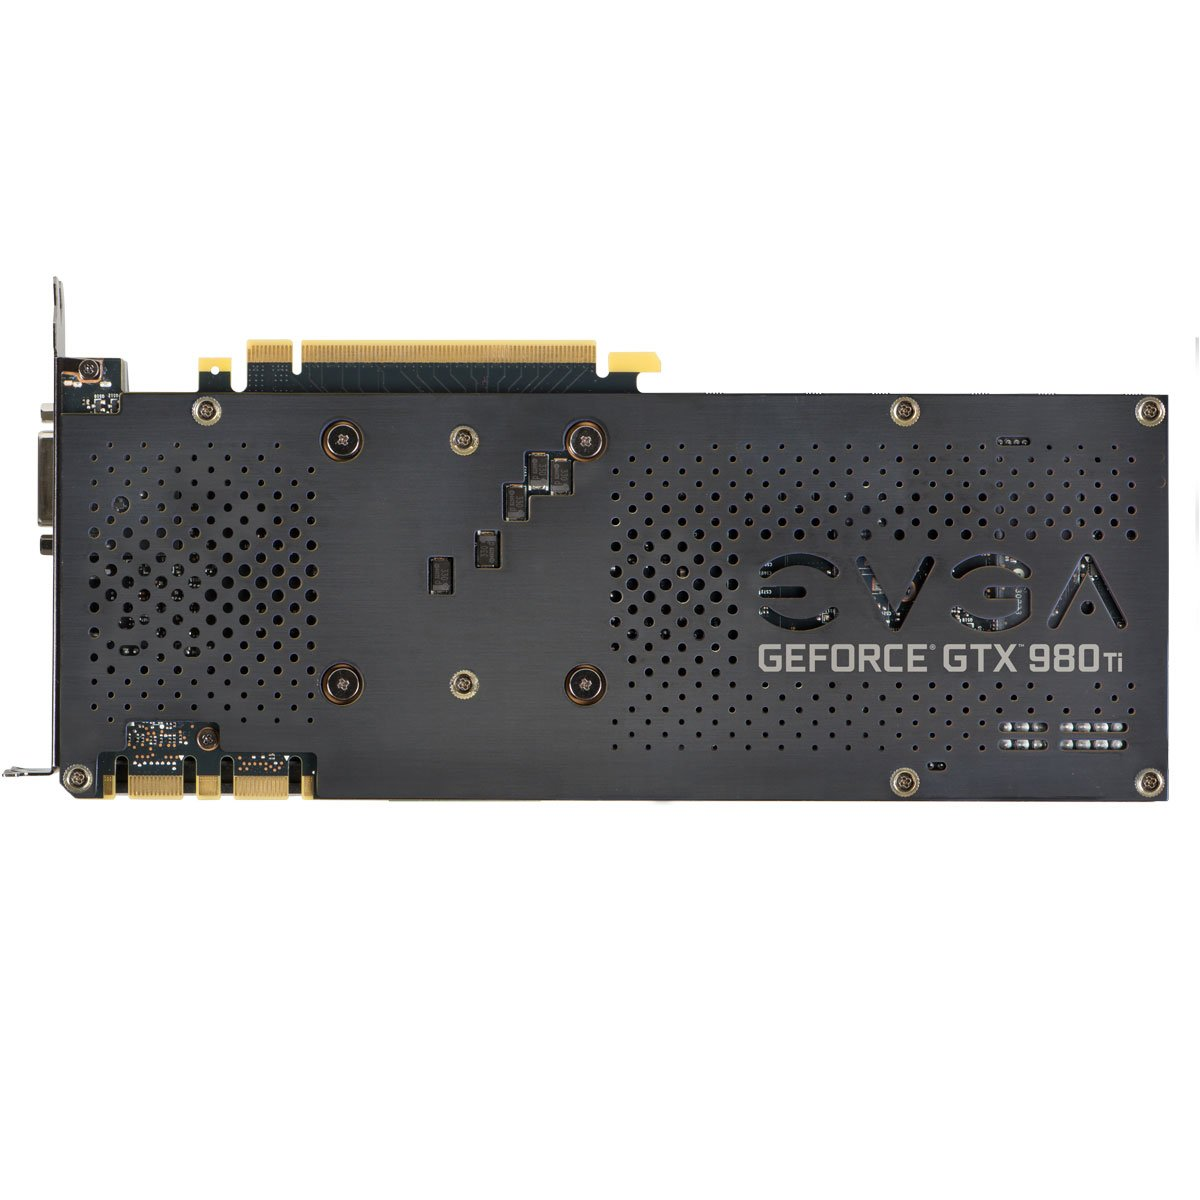 EVGA 06G-P4-4995-KR GeForce GTX 980 Ti 6GB GDDR5 - Tarjeta ...